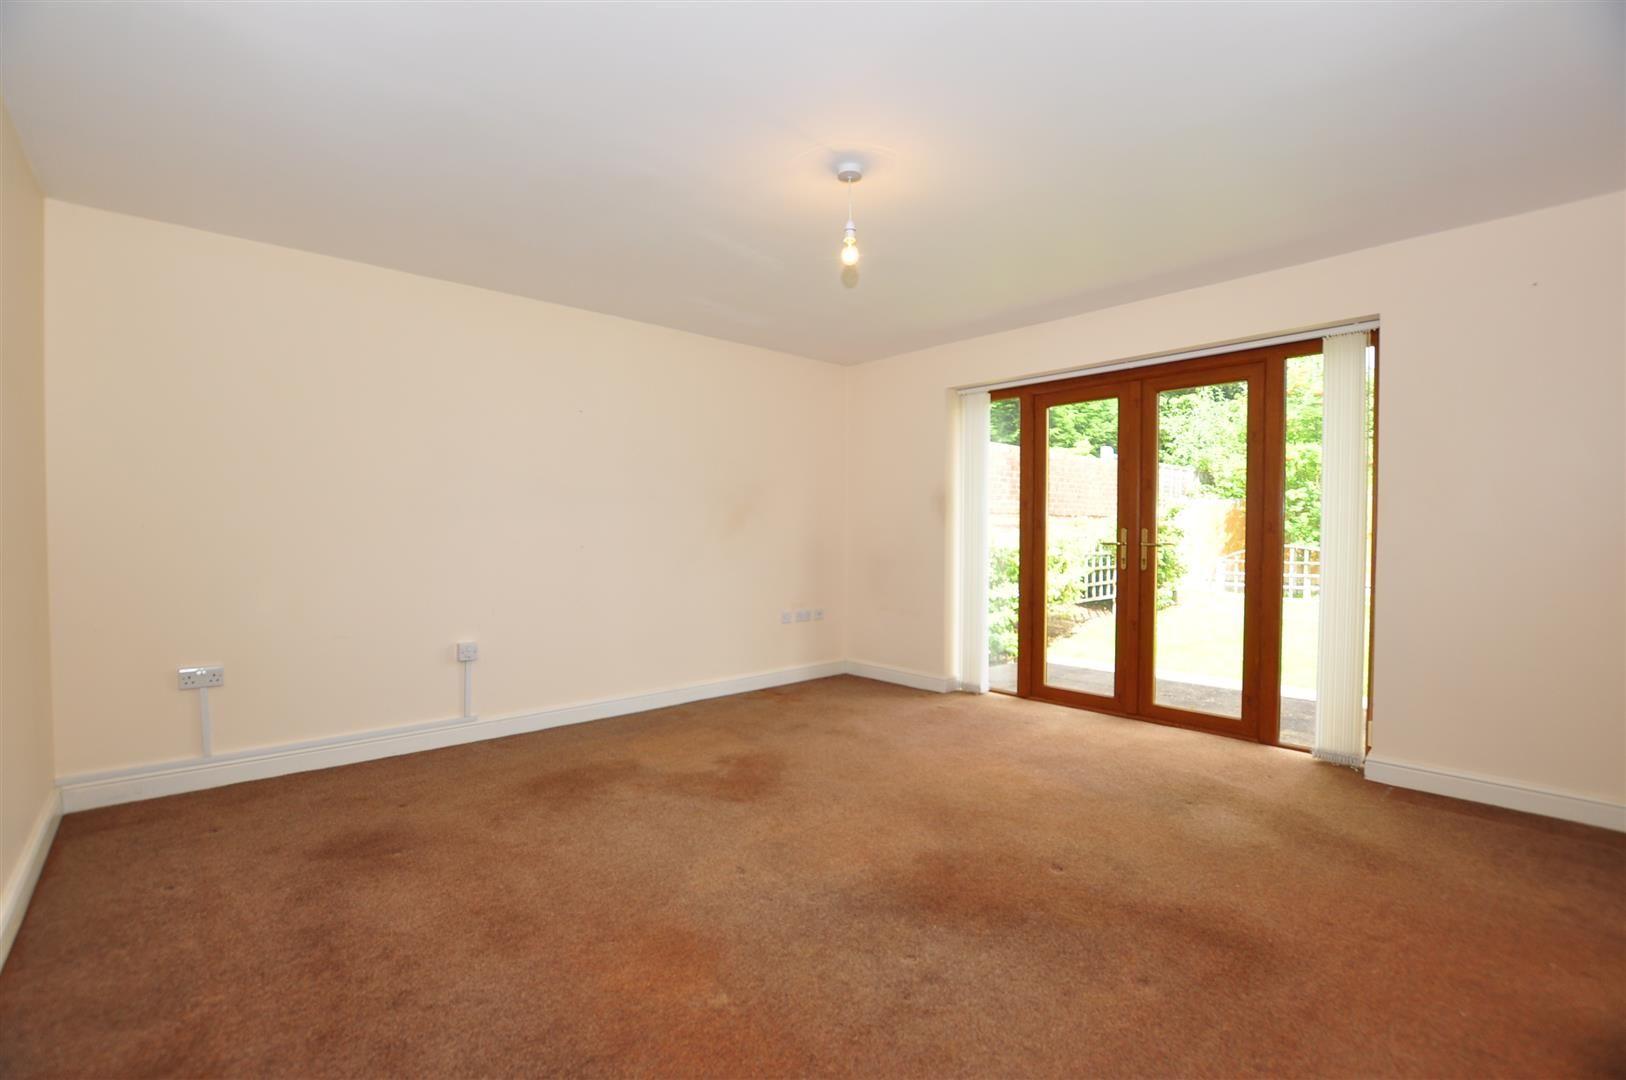 2 bed detached-bungalow for sale 3